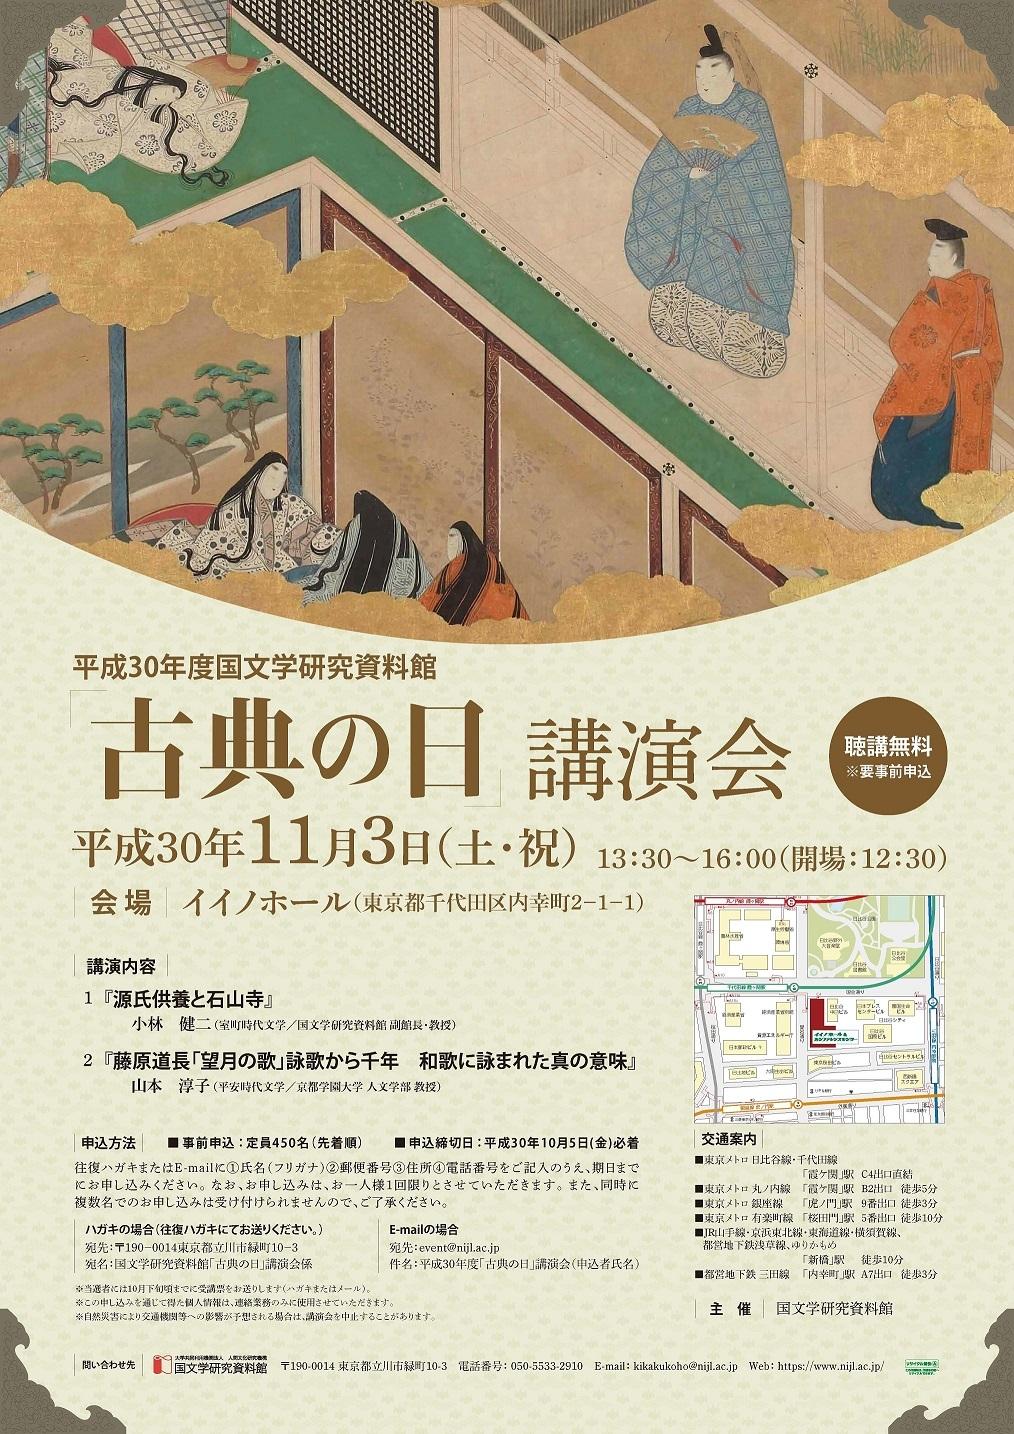 kotennohi_image2018.jpg